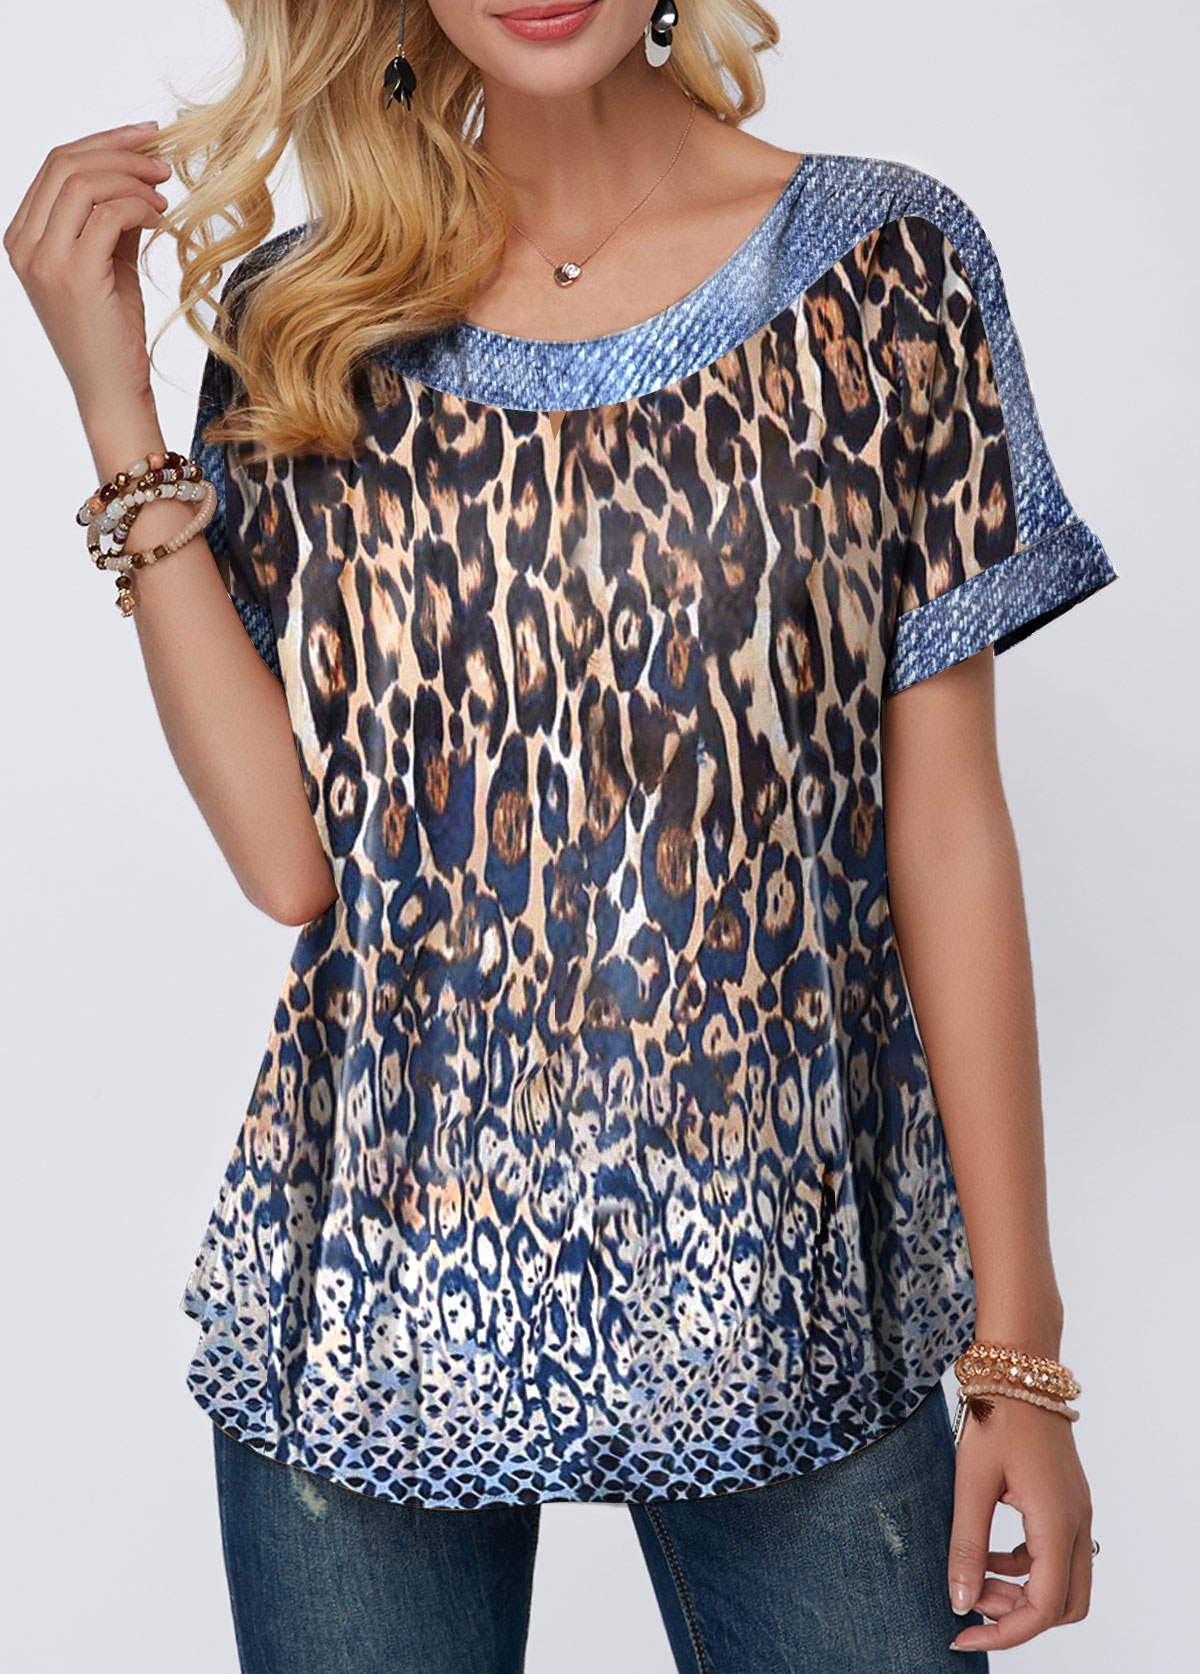 Leopard Print Round Neck Short Sleeve Blouse